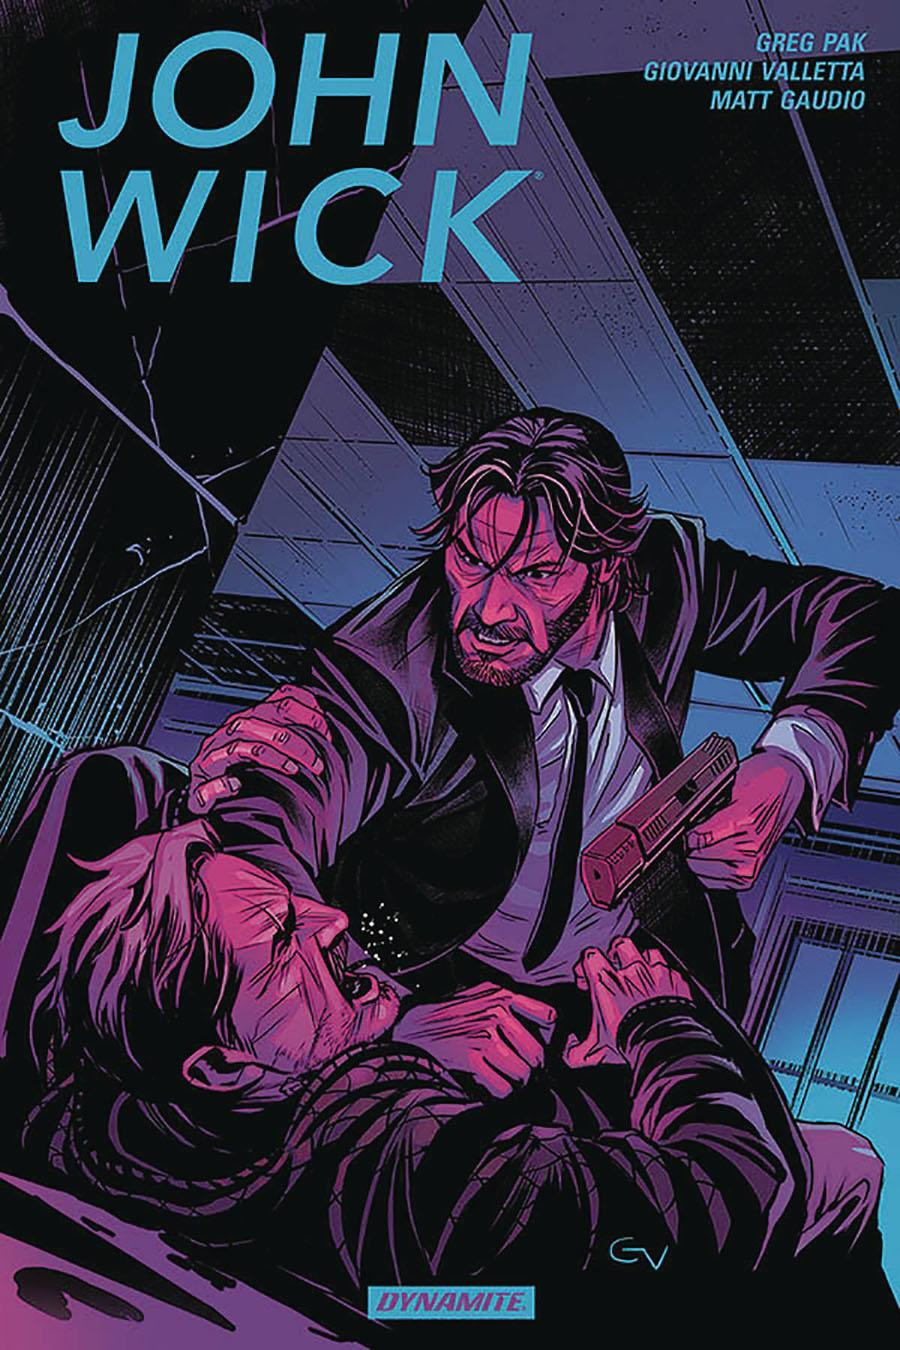 John Wick Vol 1 TP